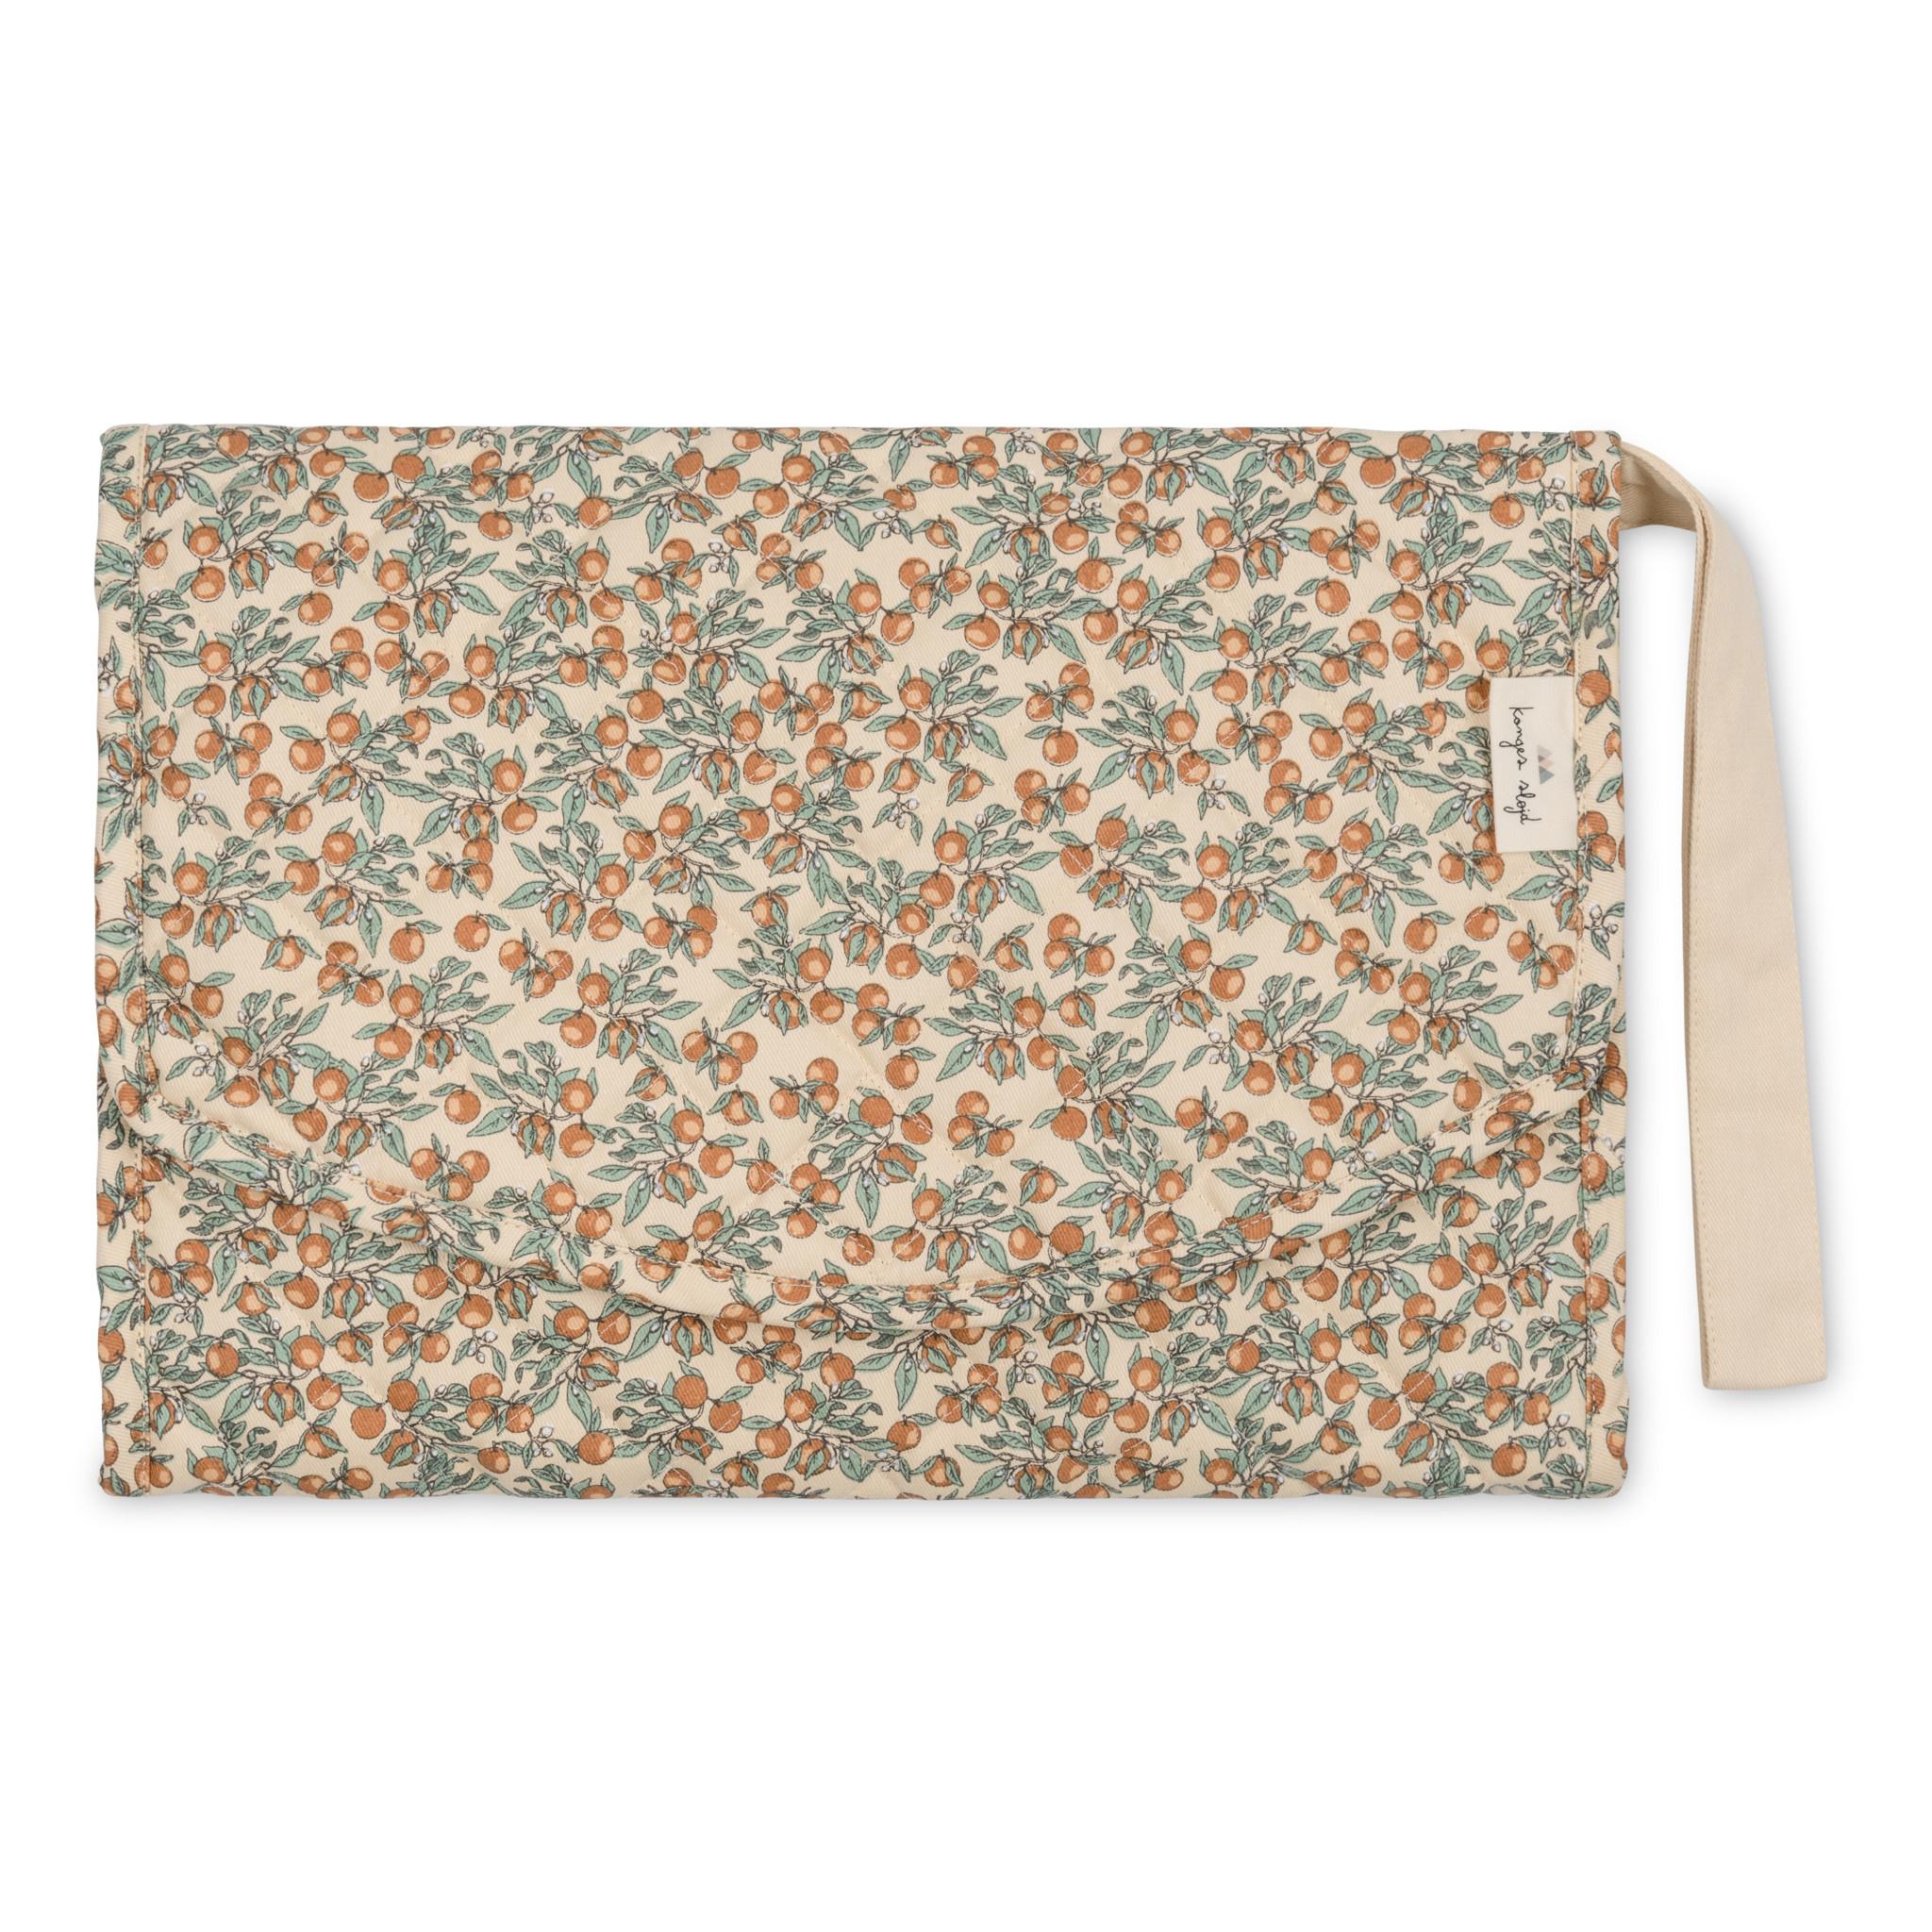 Changing pad orangery beige-1